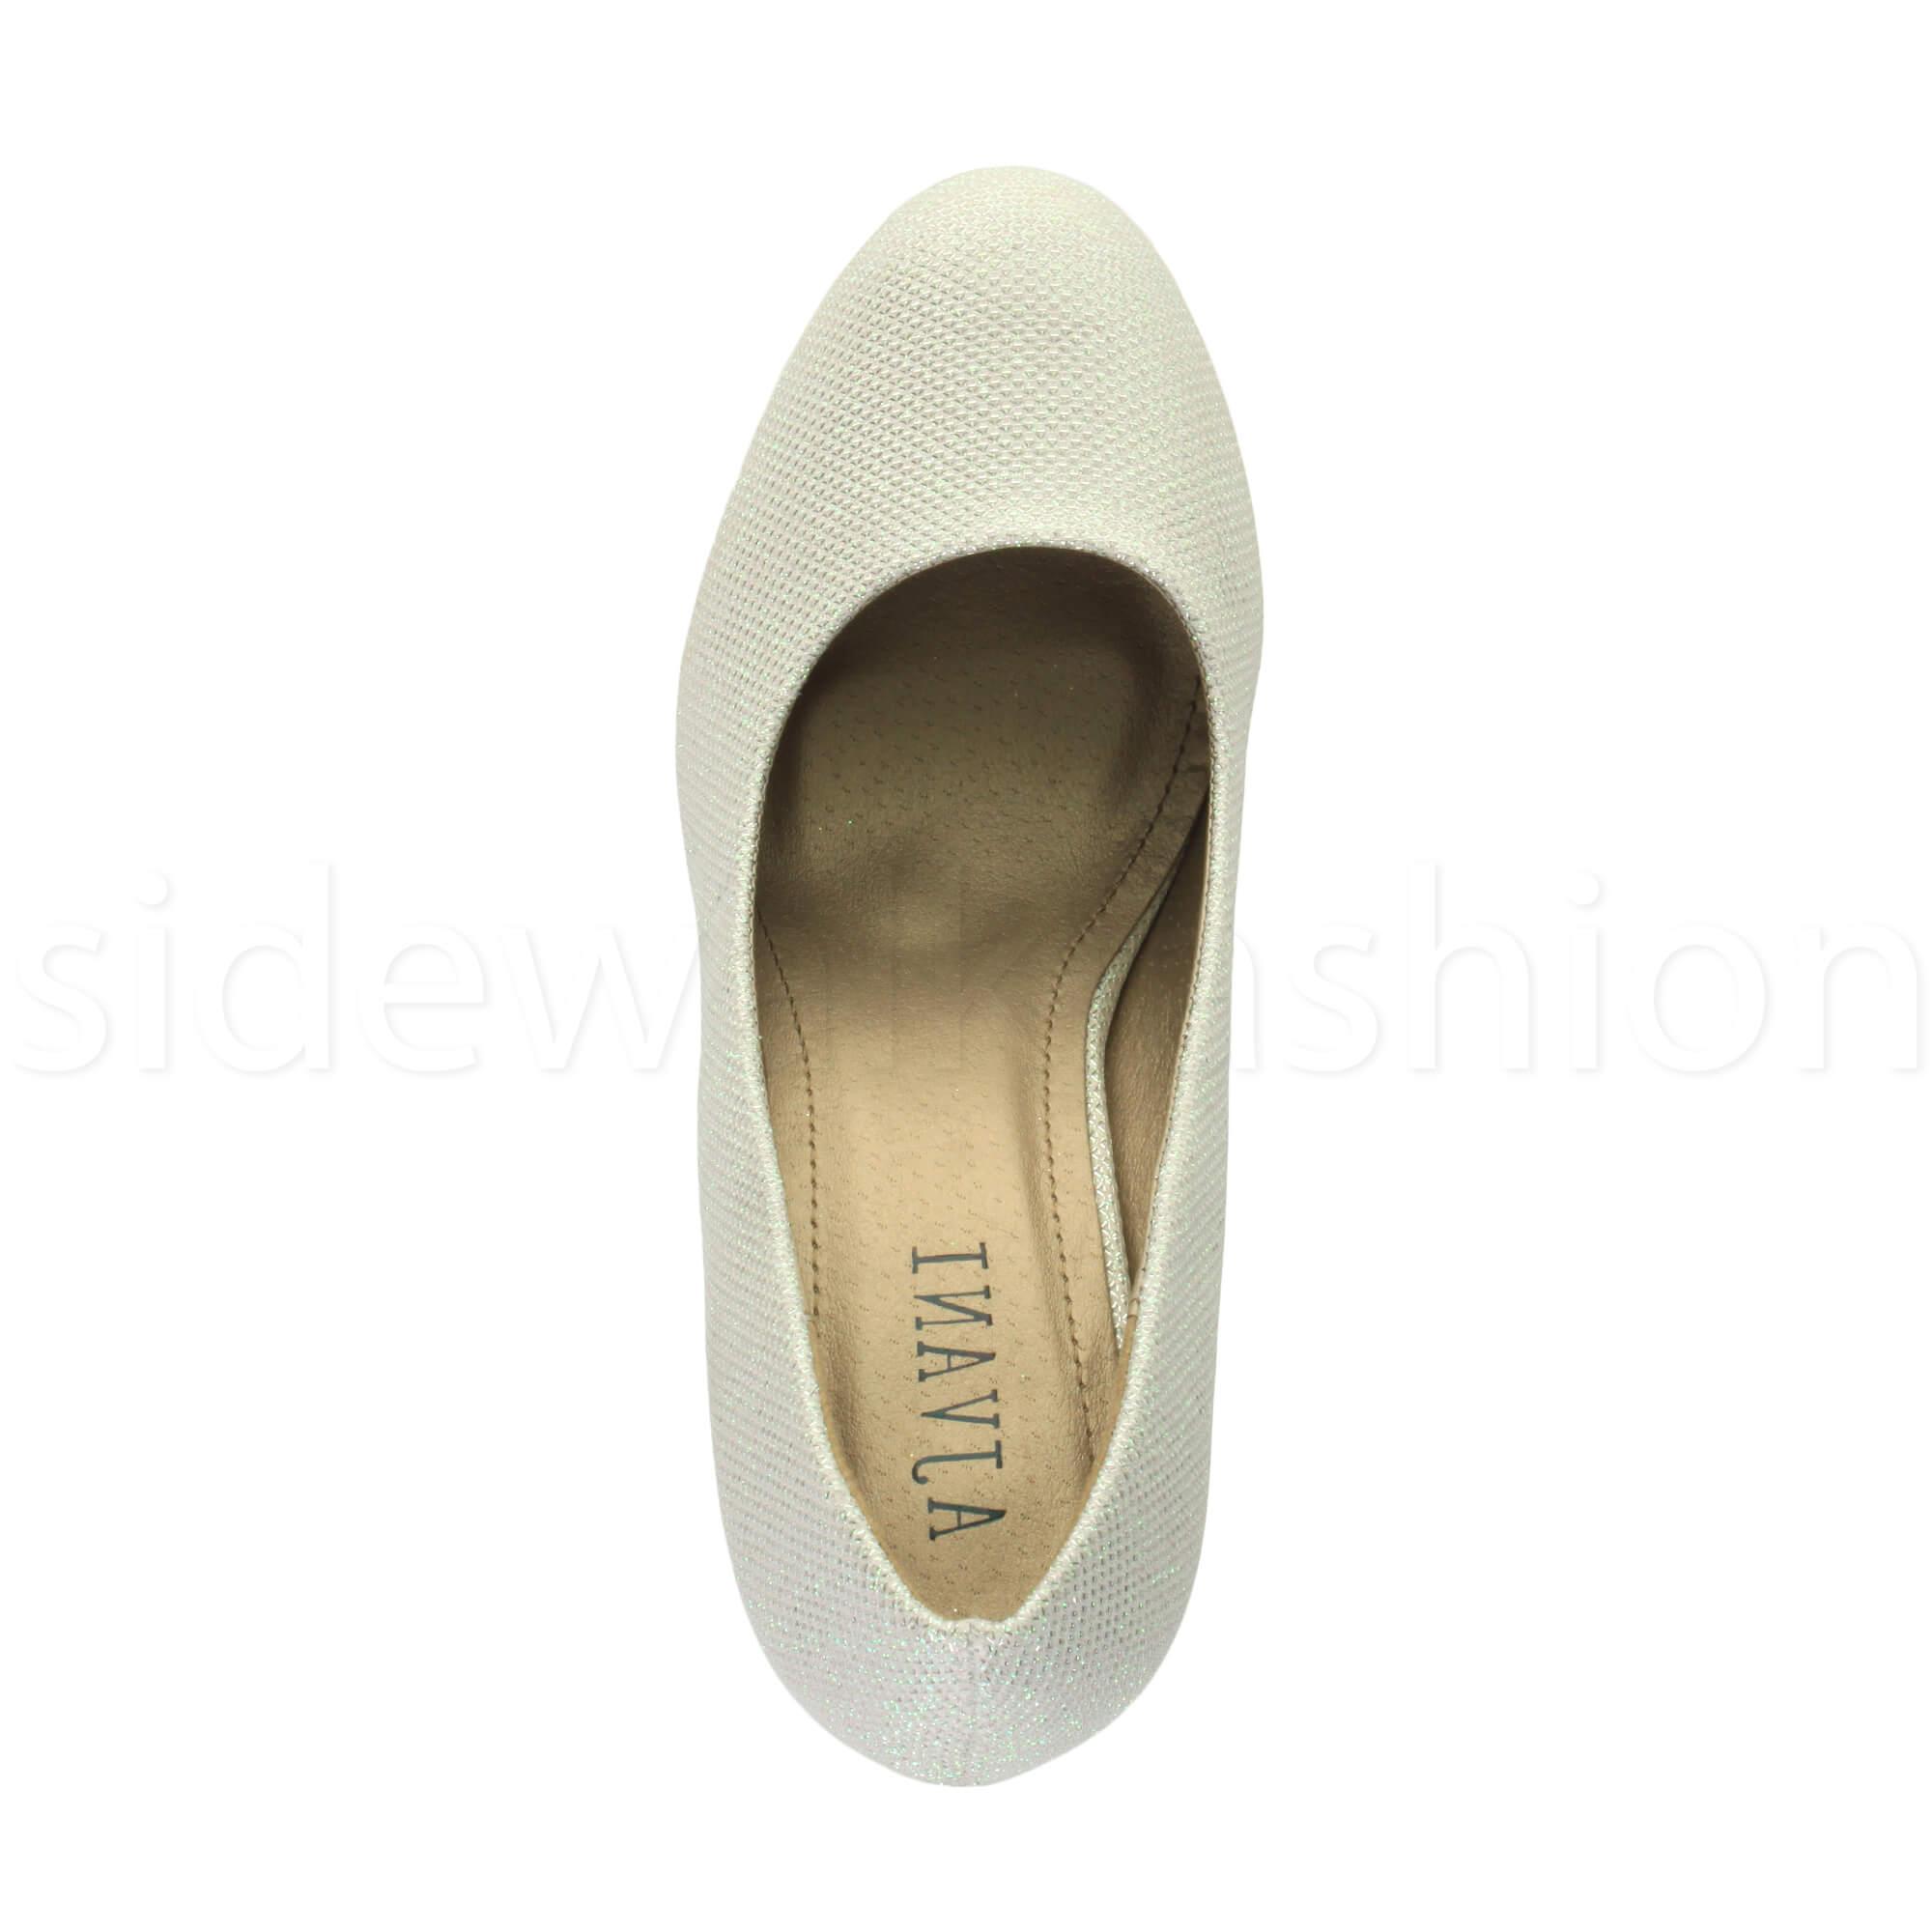 Womens-ladies-high-mid-heel-platform-wedding-evening-bridesmaid-court-shoes-size thumbnail 84